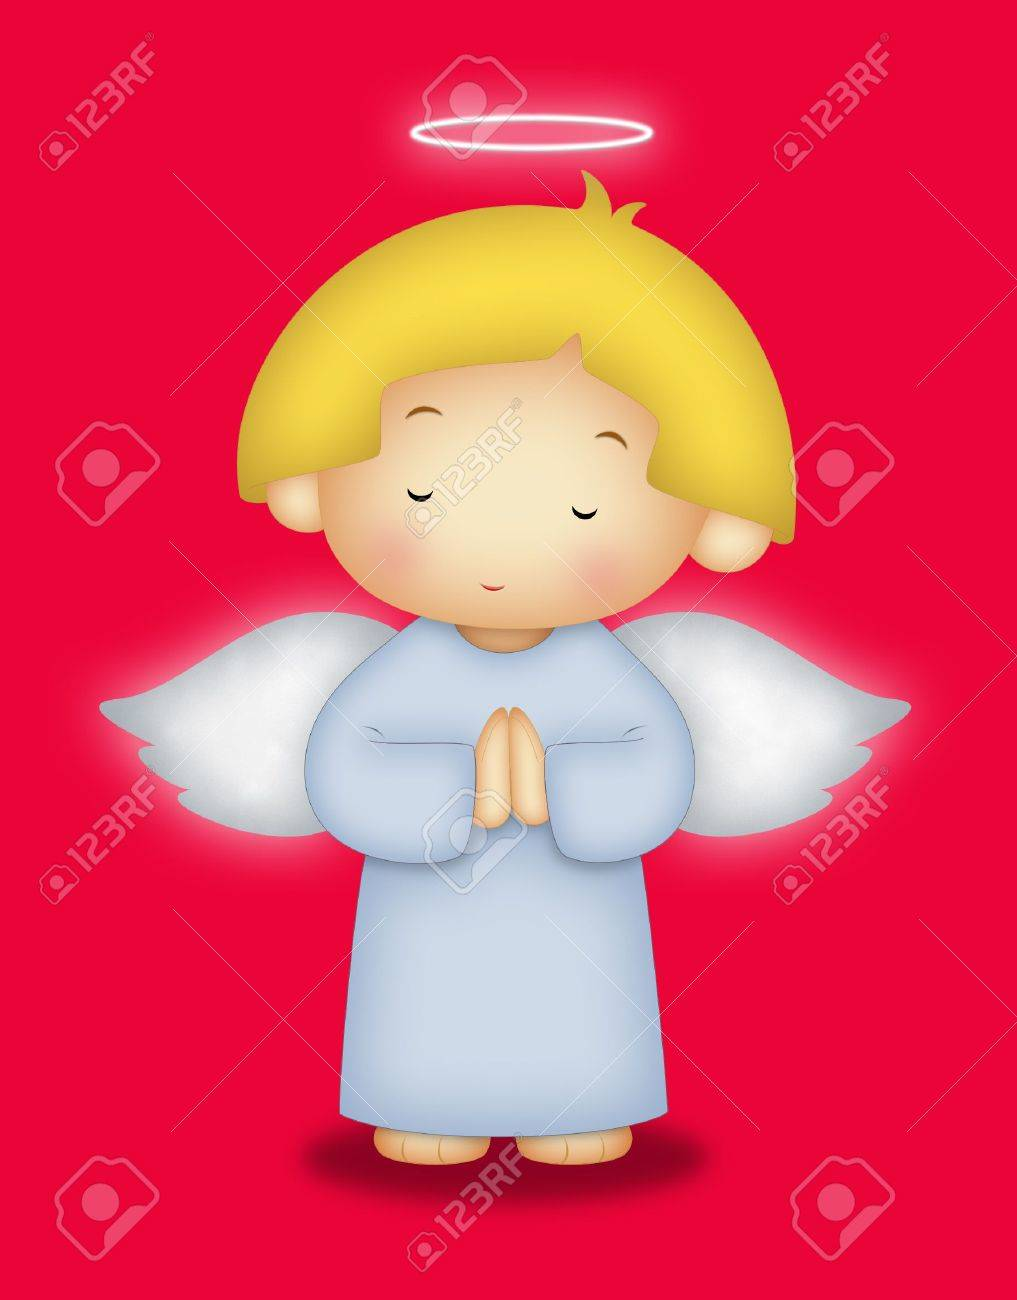 Angel with yellow hair praying. - 8066095